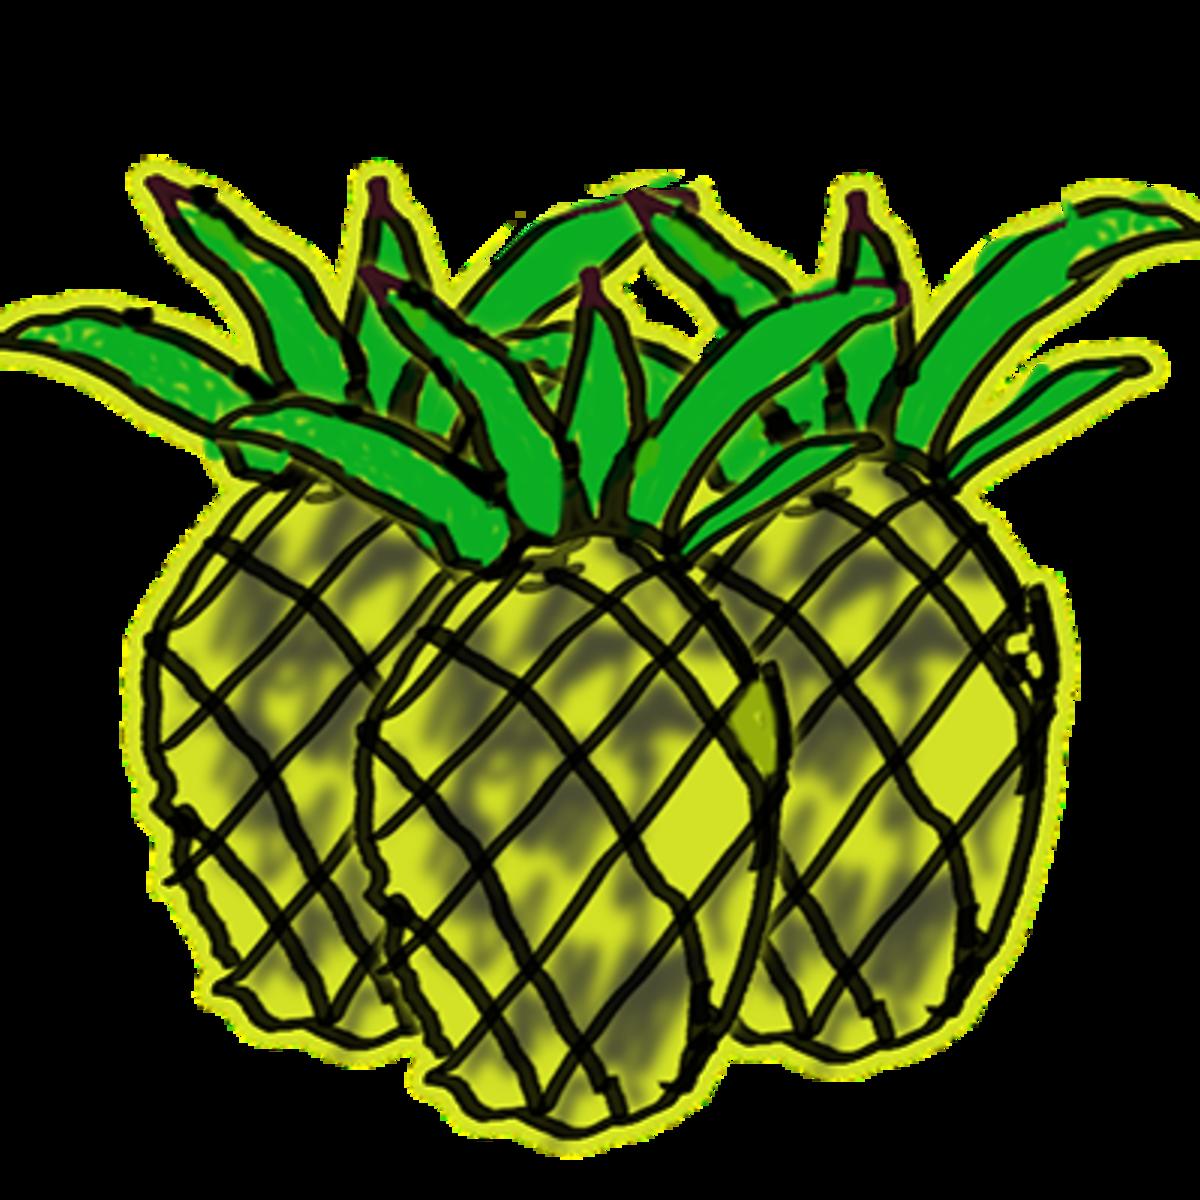 Getting Nostalgic for Vintage Pineapple Recipes